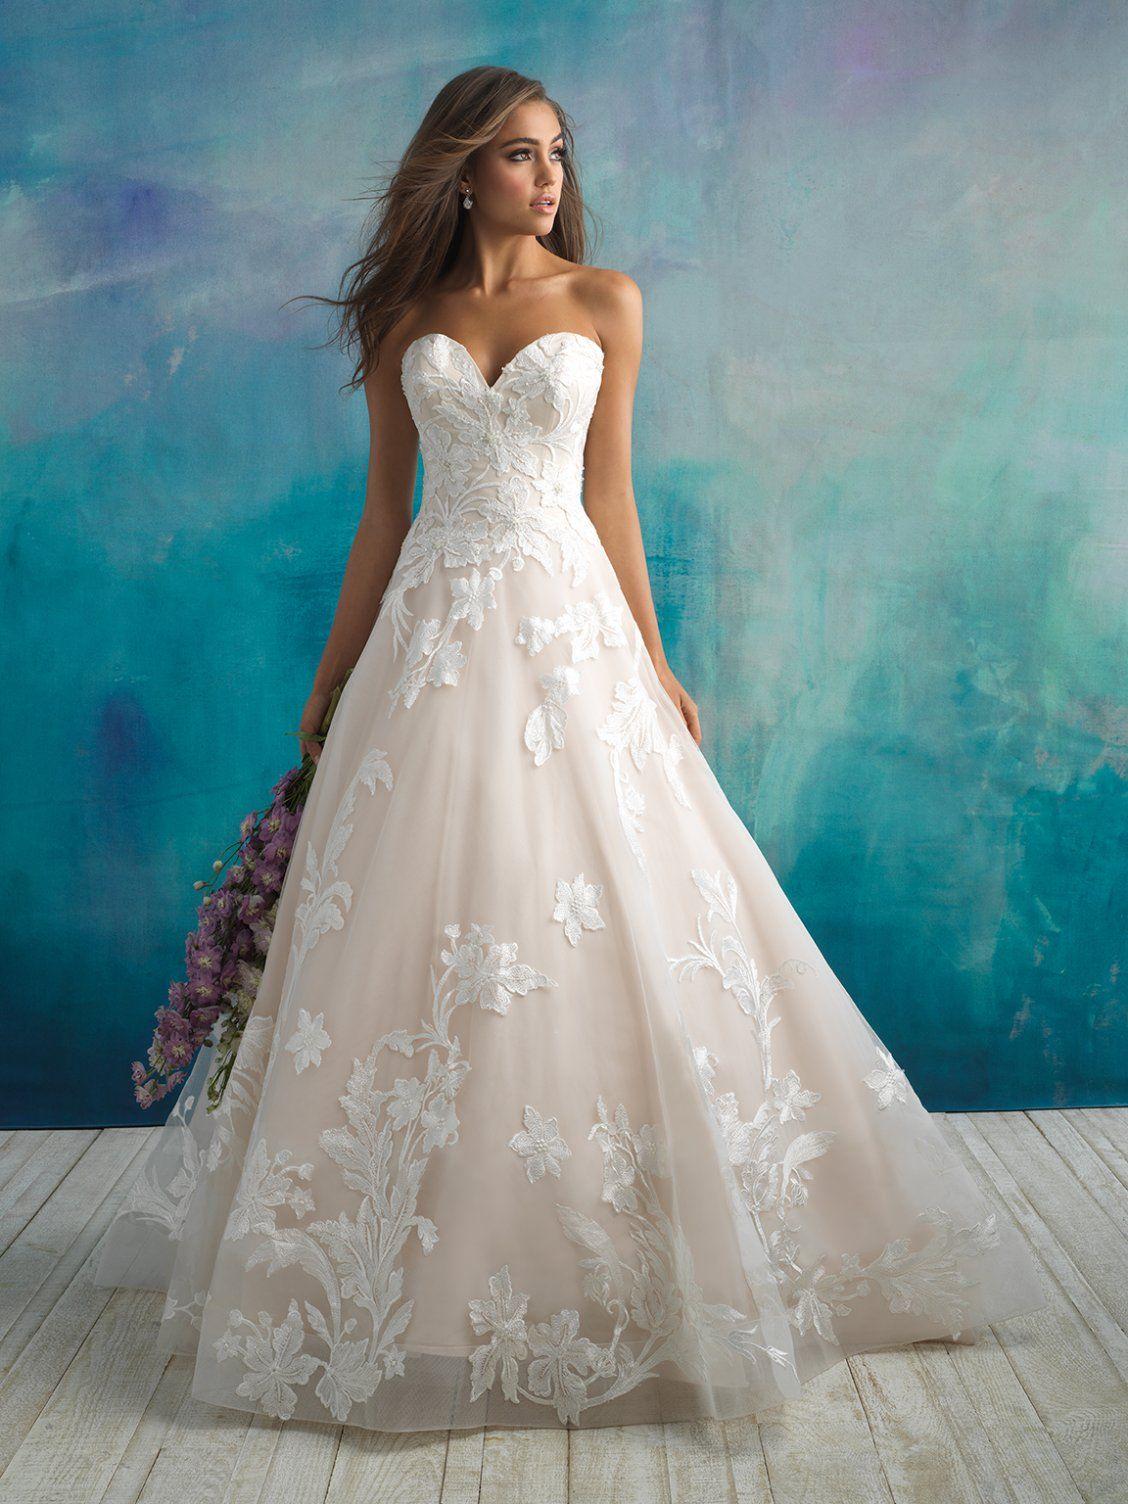 Allure bridals 婚禮 pinterest allure bridal wedding